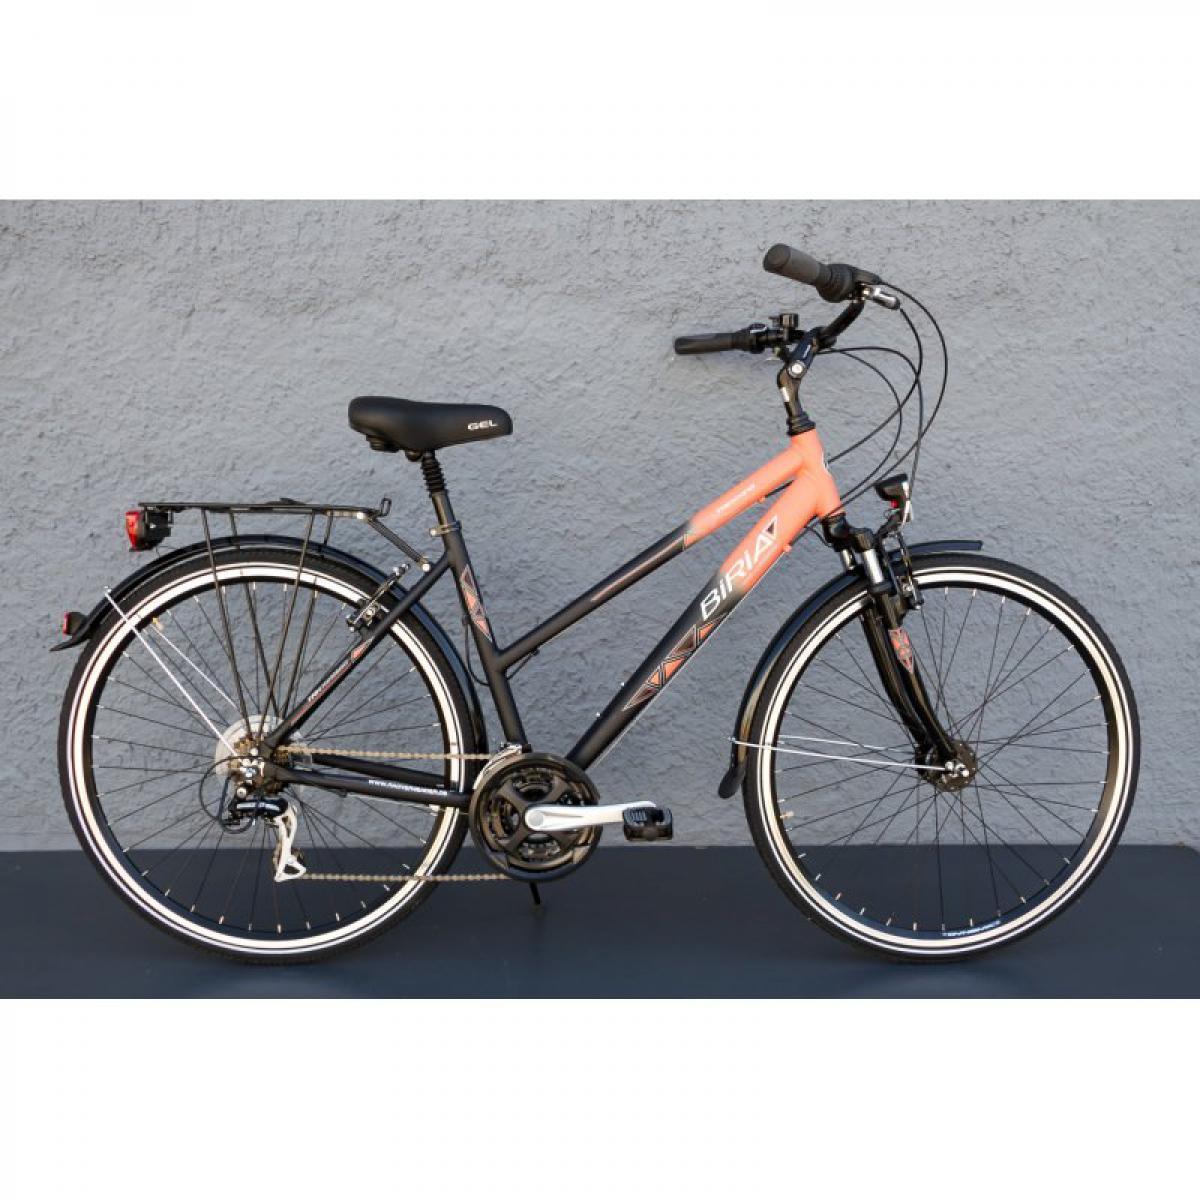 28 zoll alu biria damen trekking bike shimano 21 gang nabendynamo schwarz orange ihr fahrrad. Black Bedroom Furniture Sets. Home Design Ideas